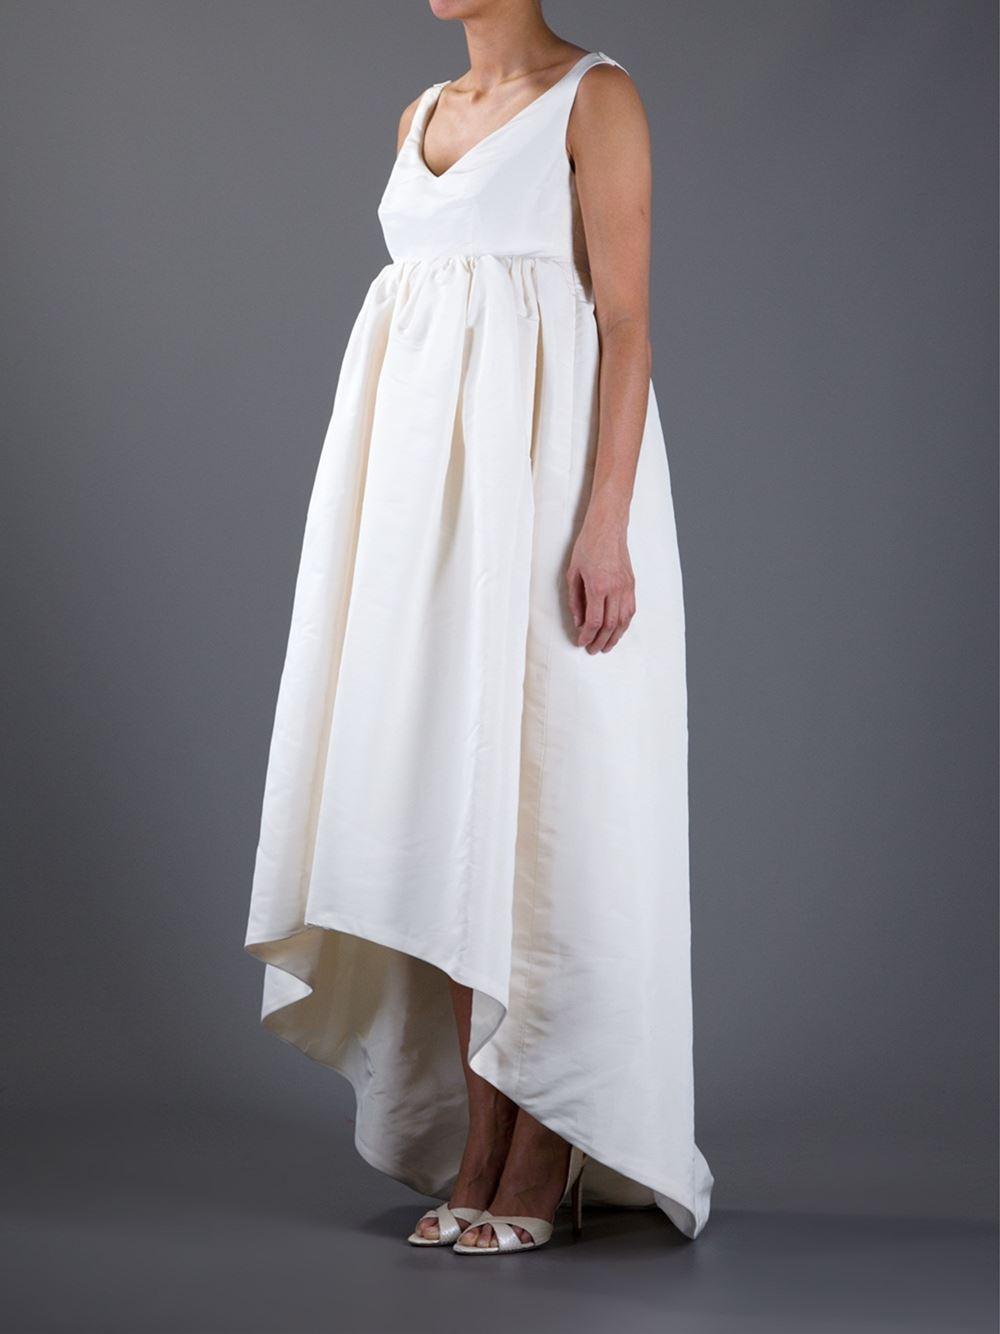 Balenciaga Bridal Dress In White Lyst